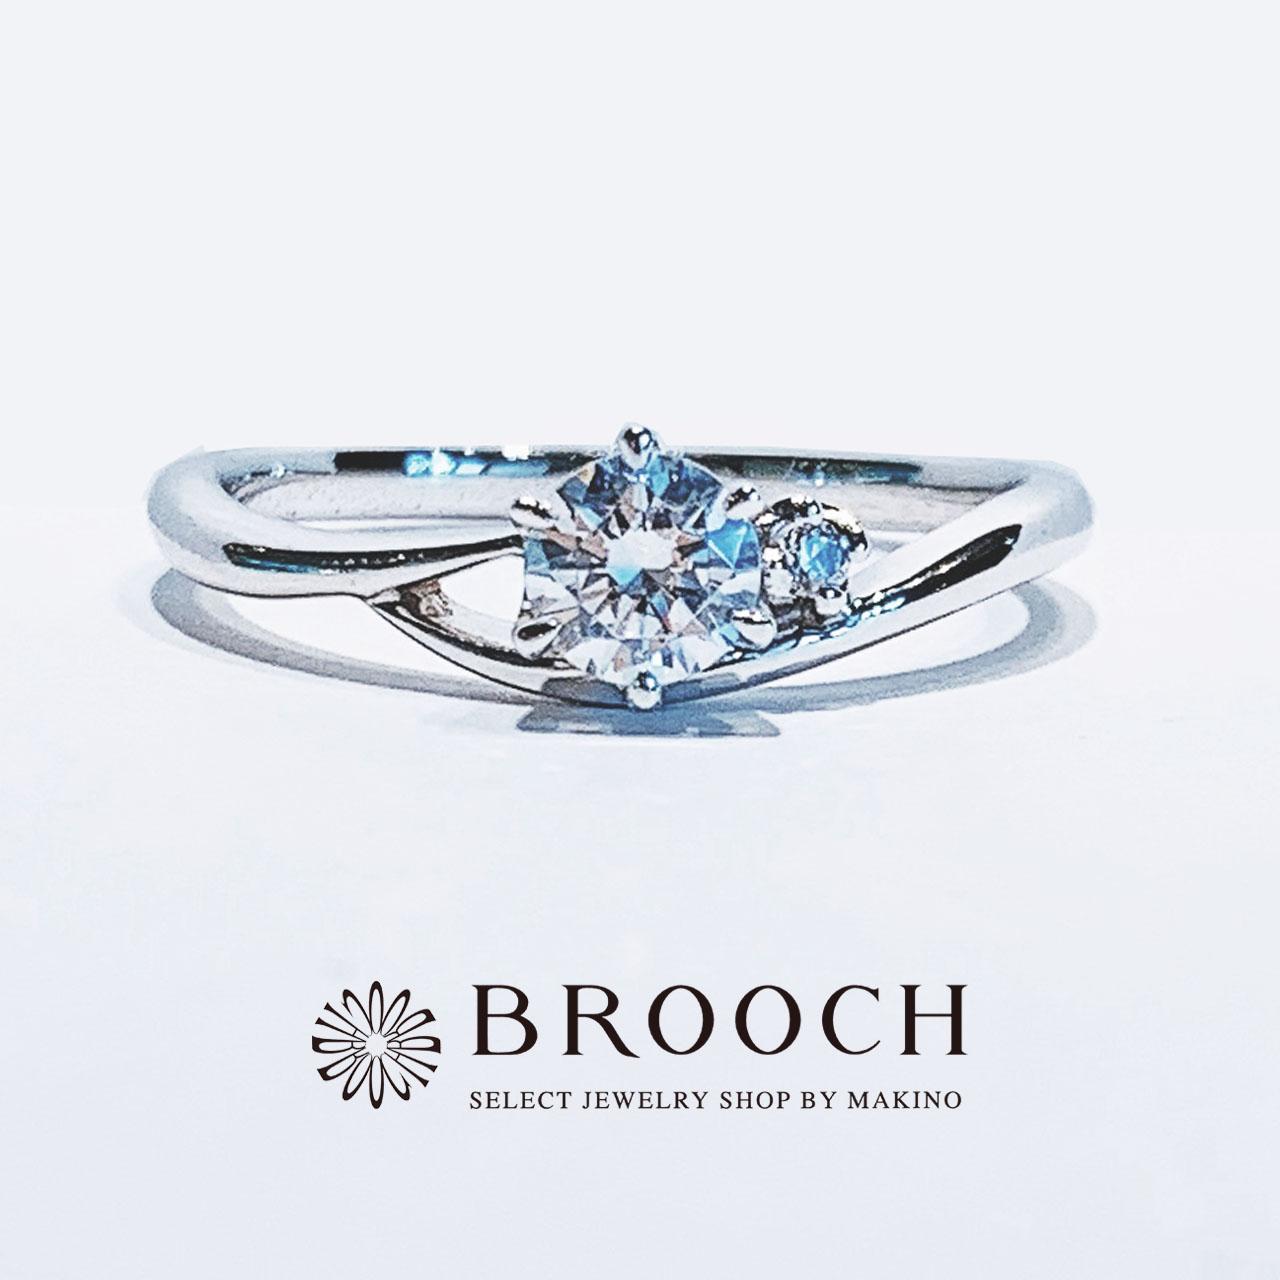 BROOCH 婚約指輪 エンゲージリング かわいい シンプルデザイン